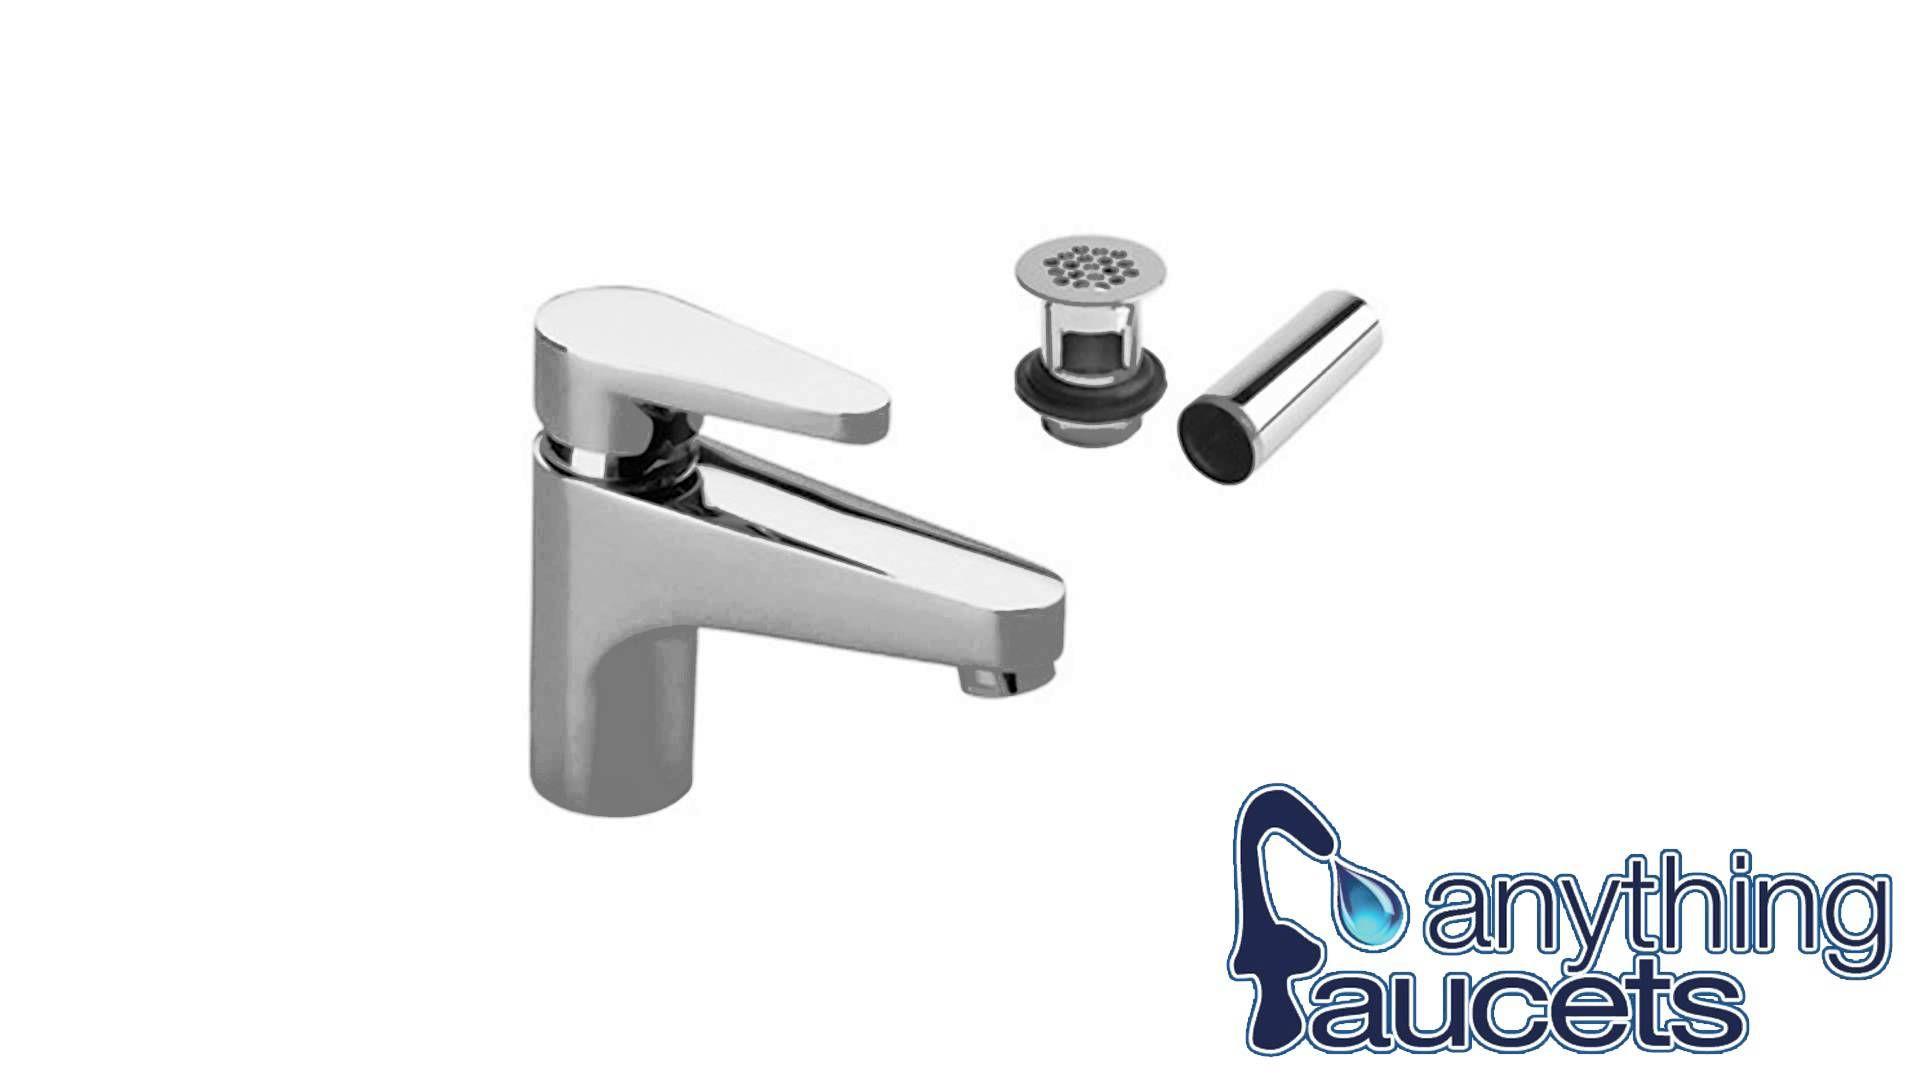 Altmans Gemma Bathroom Faucets at anythingfaucets.com | Altmans ...